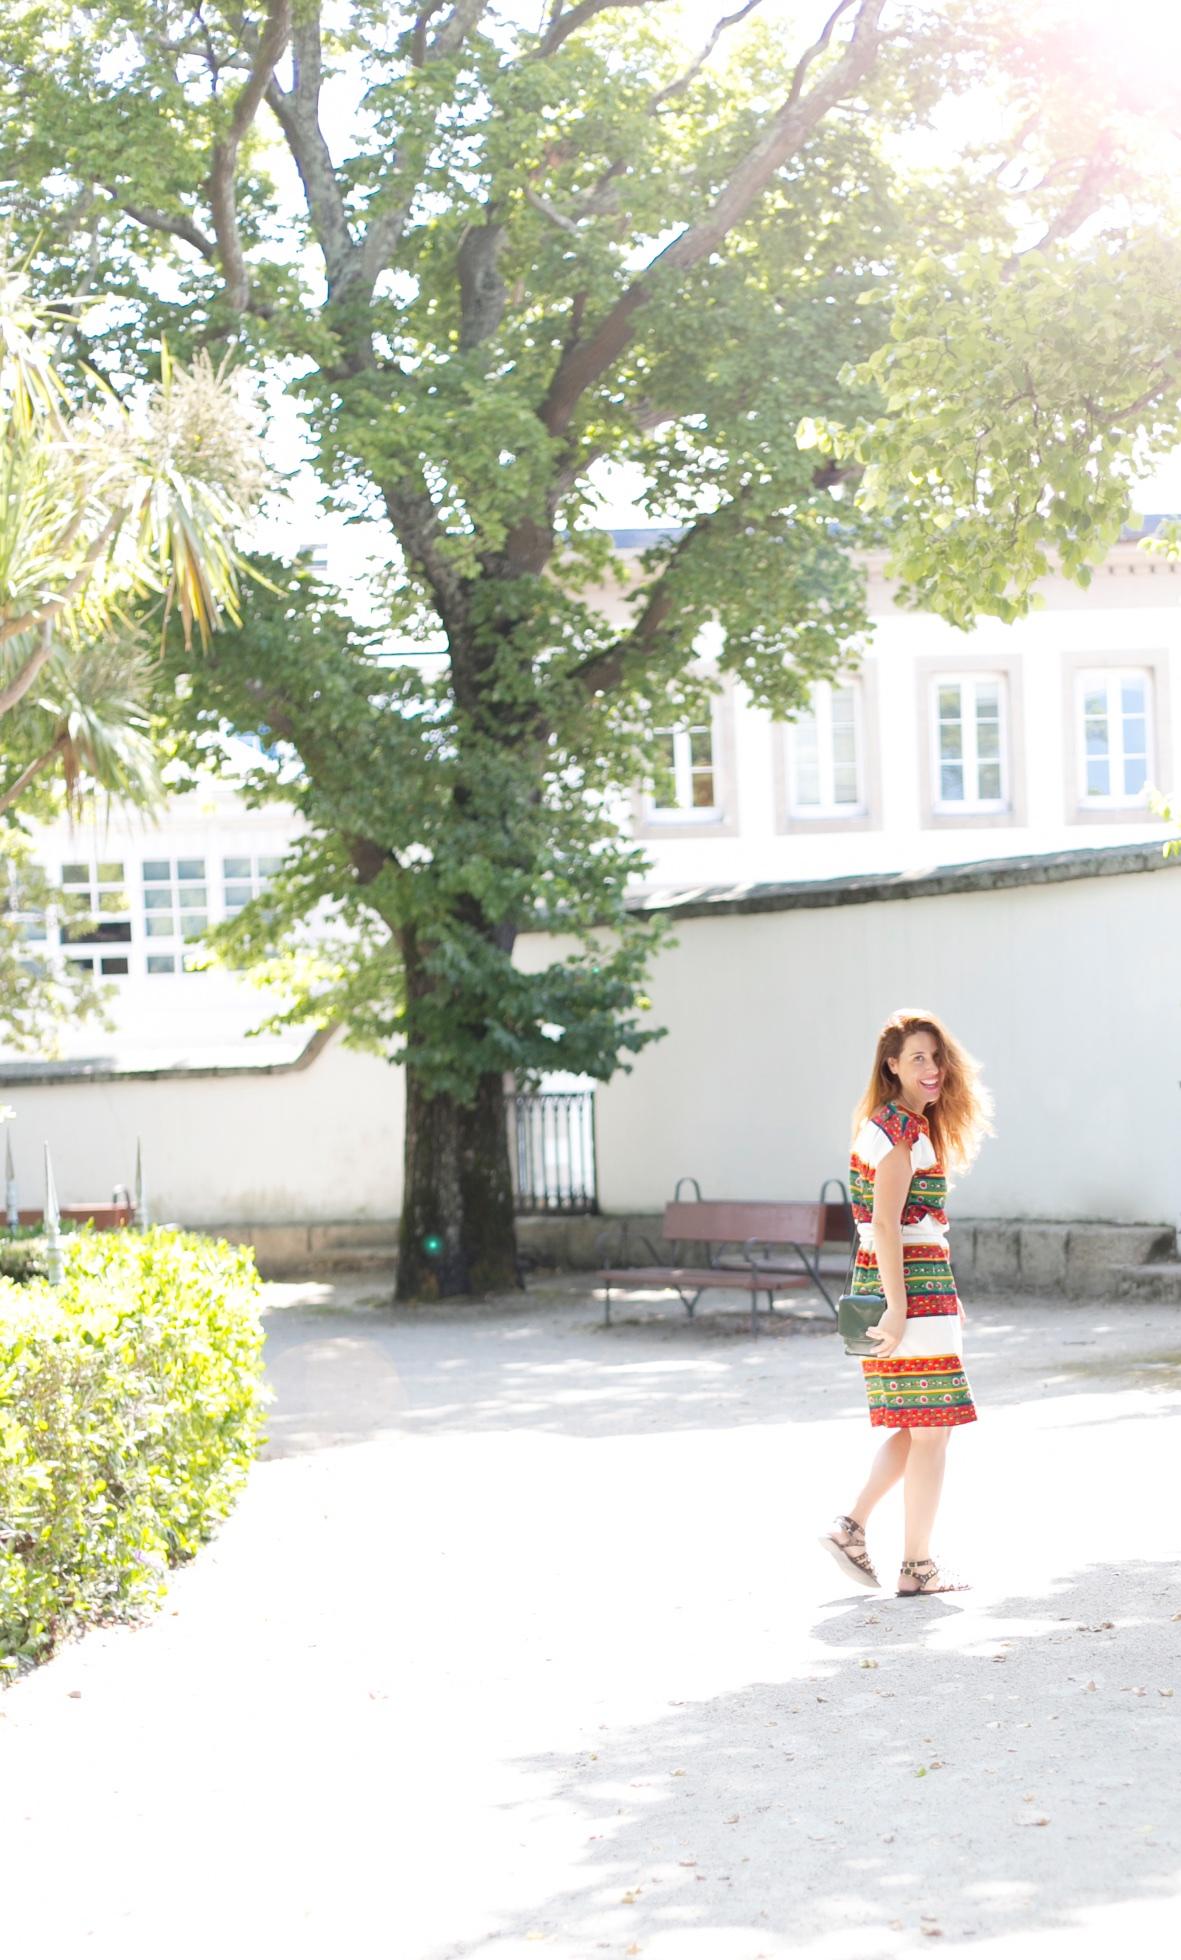 calles-coruña-moda-calle-vintage-vestido-vintage-descalzaporelparque-fashion